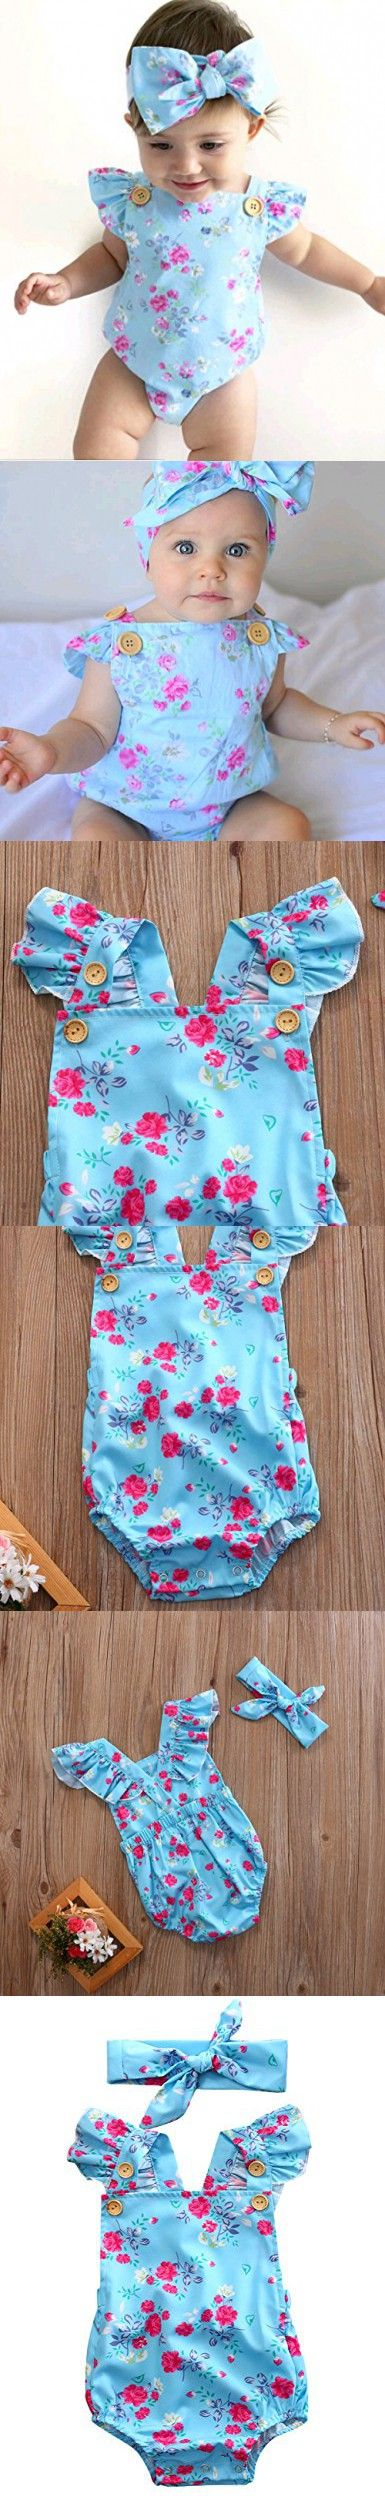 Baby Girls' Full Flower Print Buttons Ruffles Romper Bodysuit with Headband (90(12-18M), Blue(with headband))